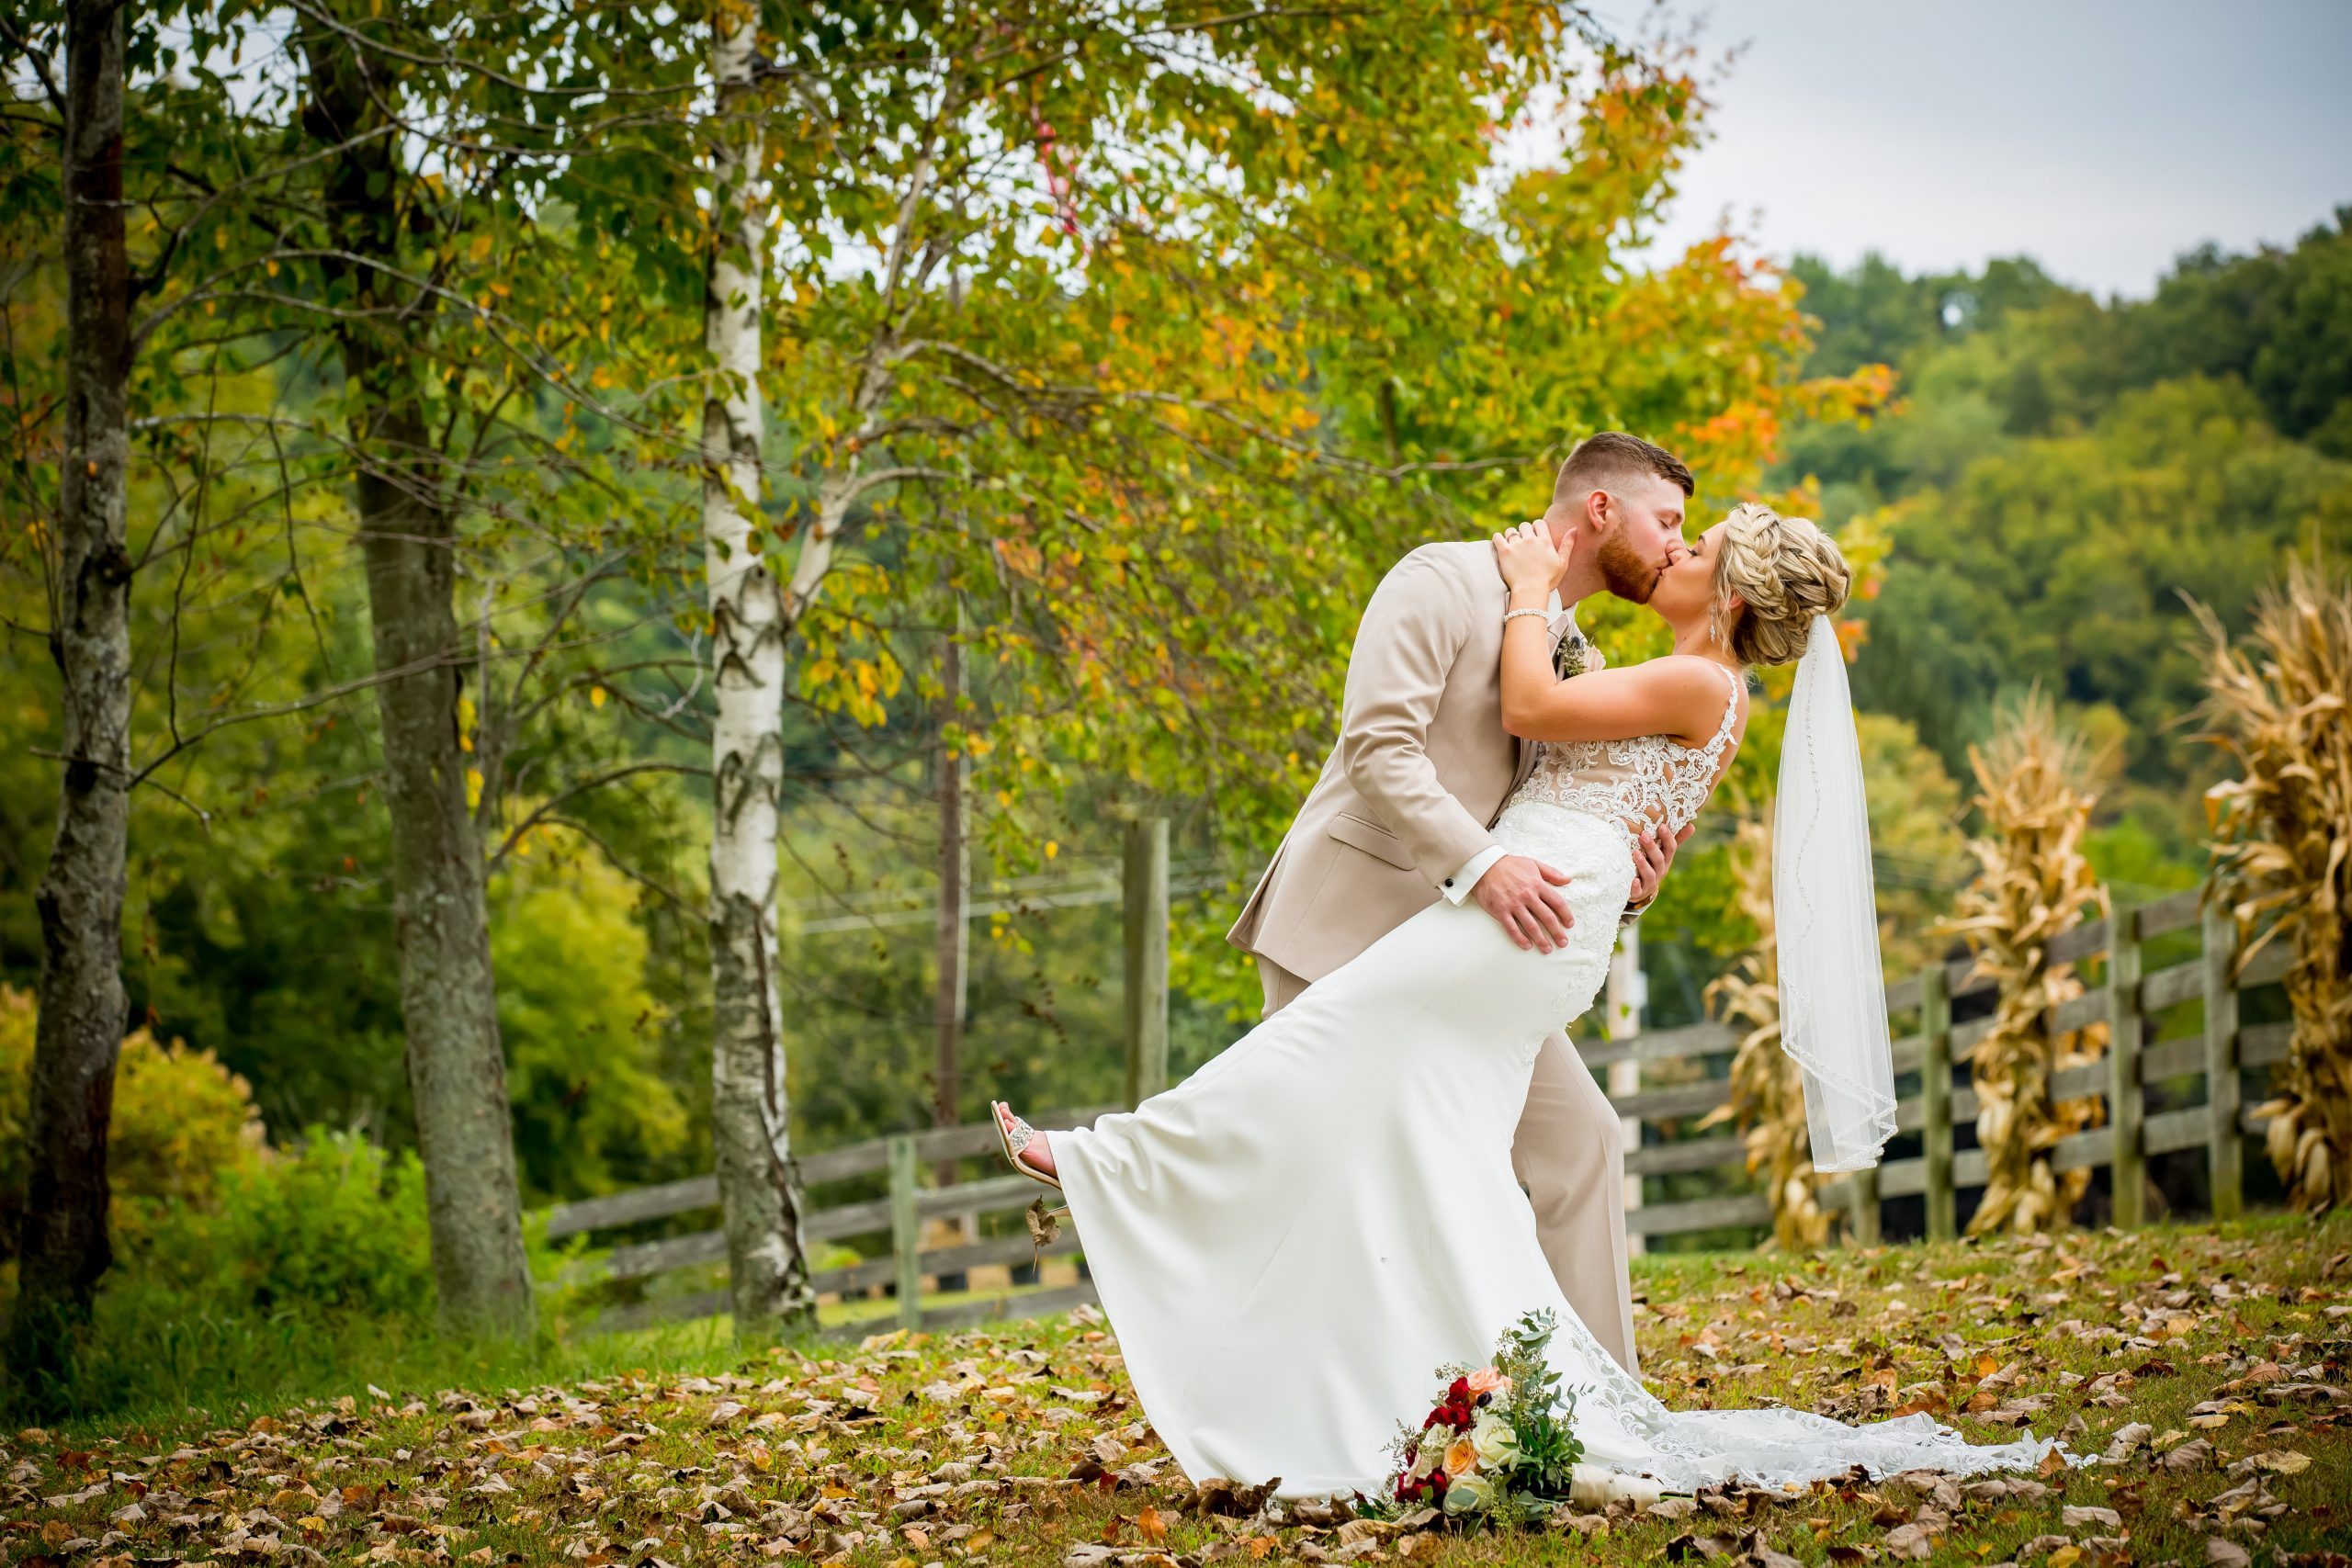 liberty_ridge_wedding10.jpg